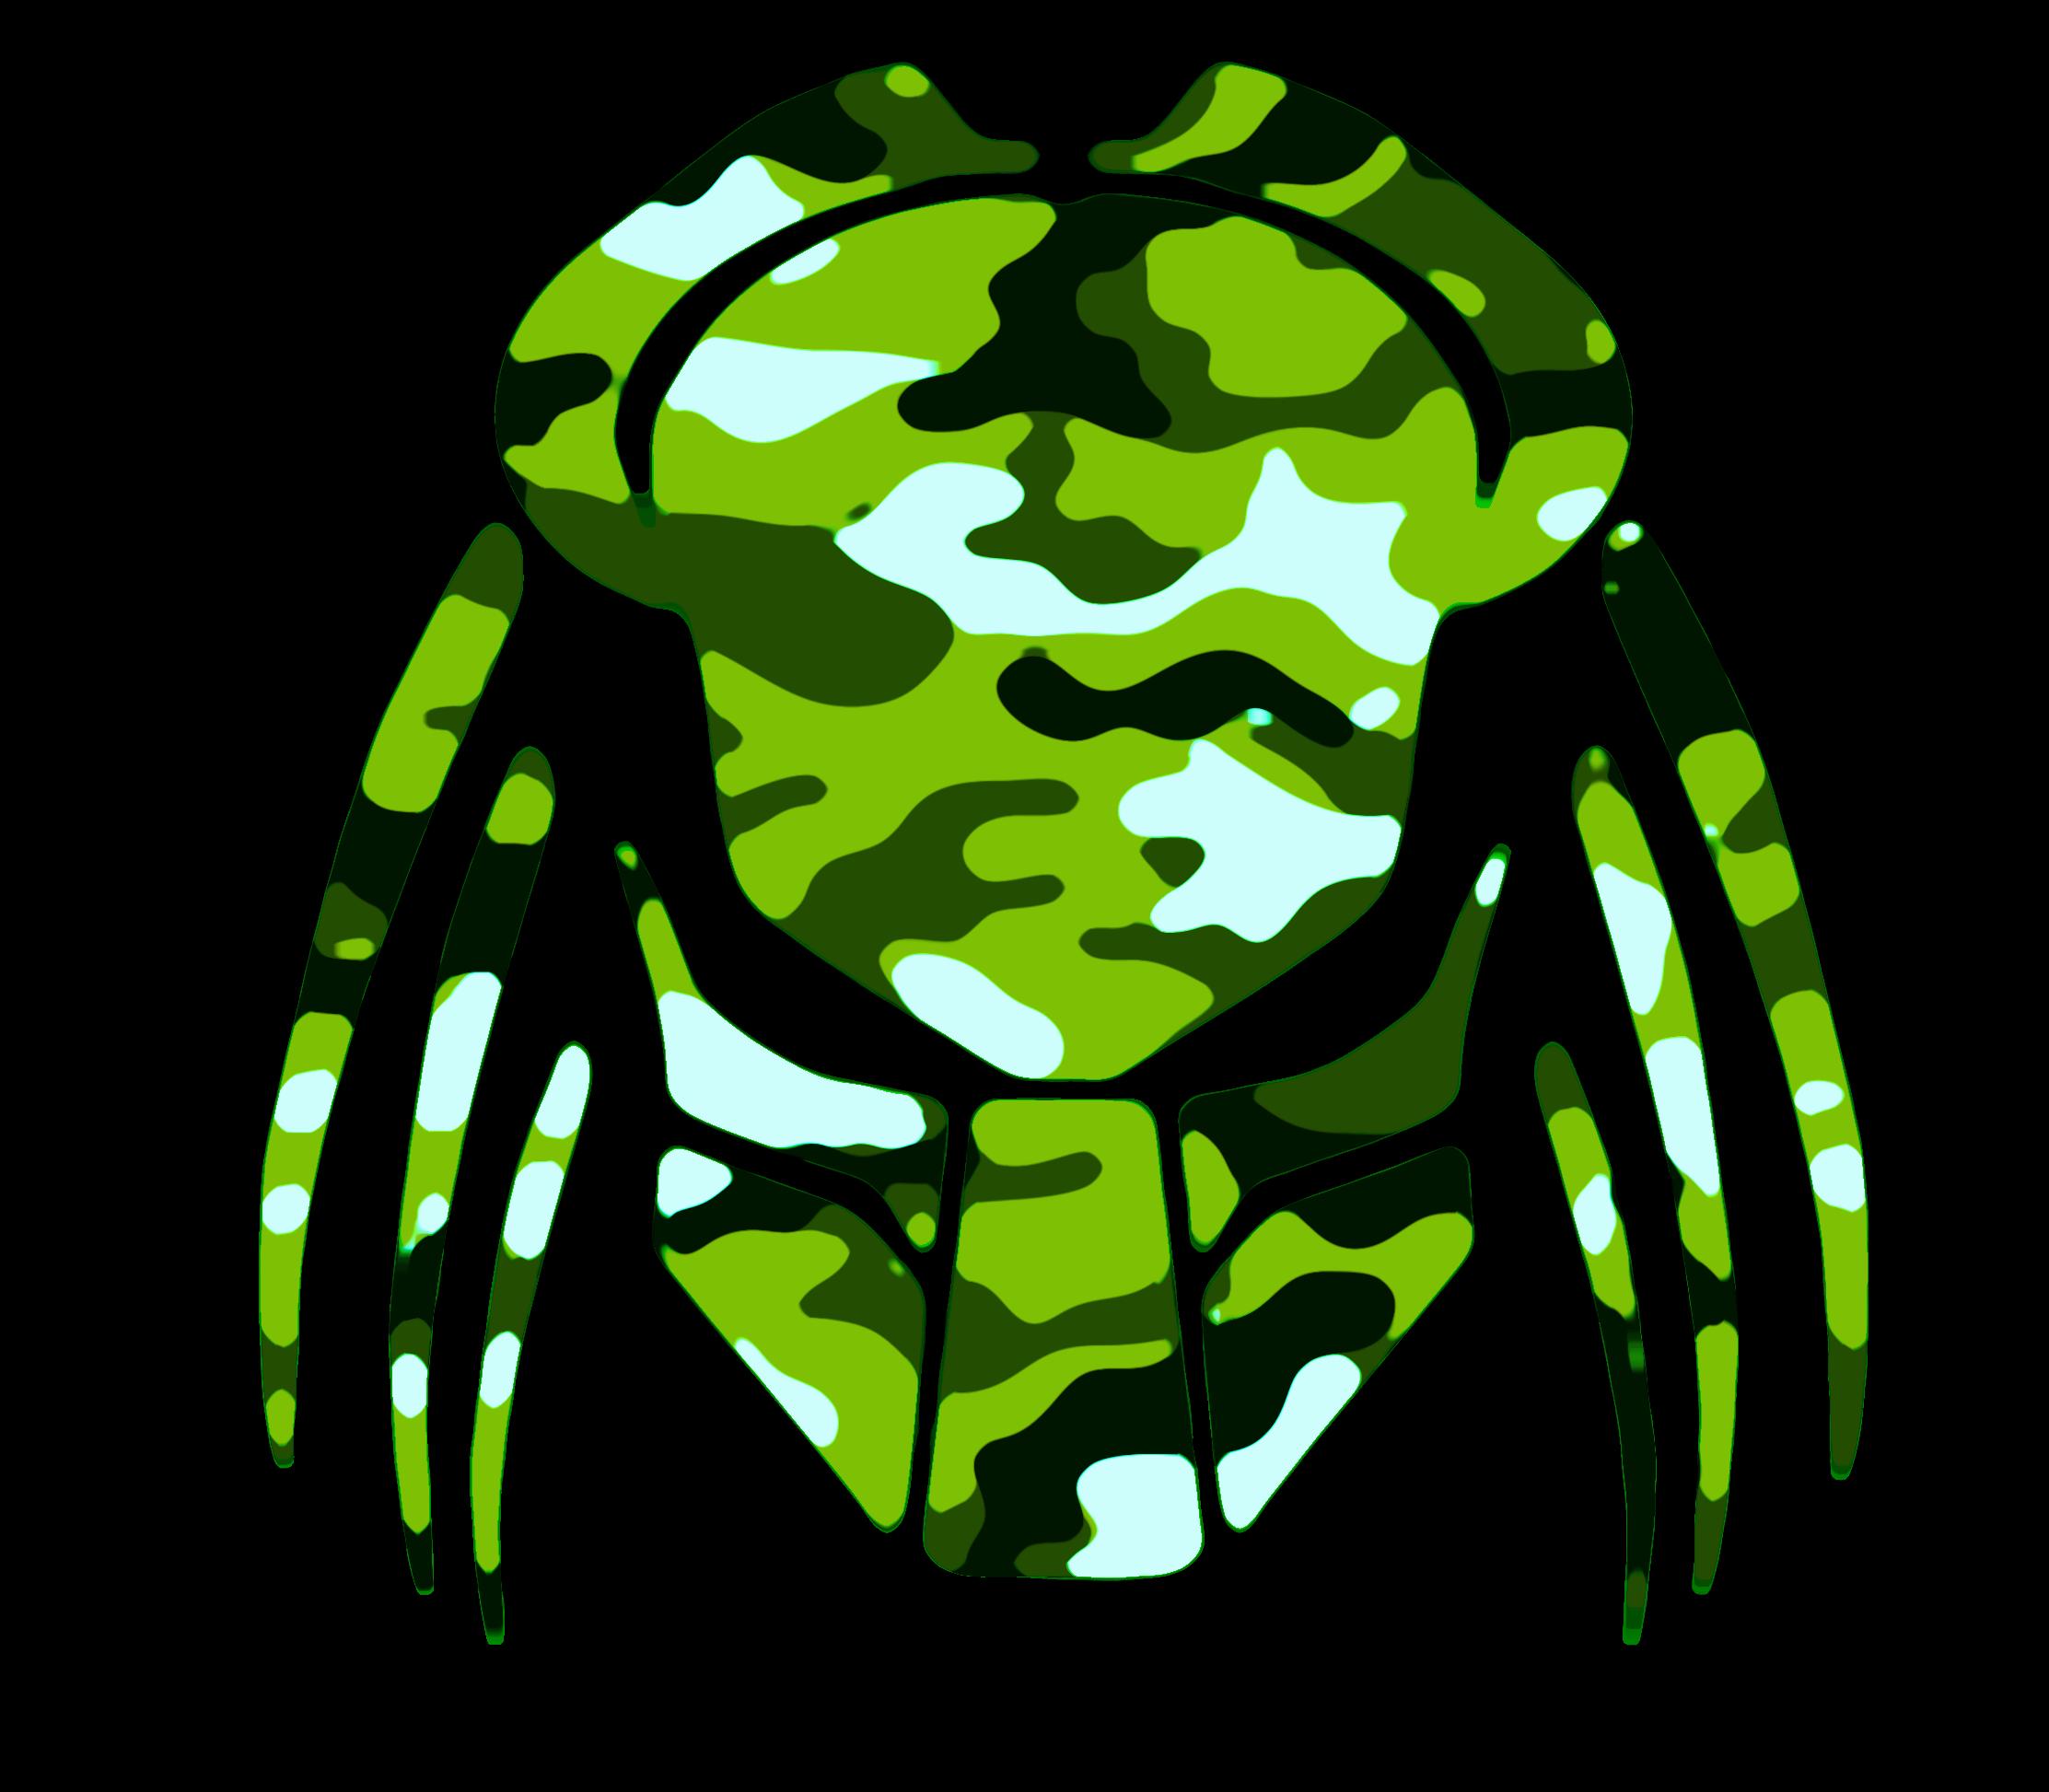 2225x1946 Cybergoth Cut Lime Green Camo Cut Free Images